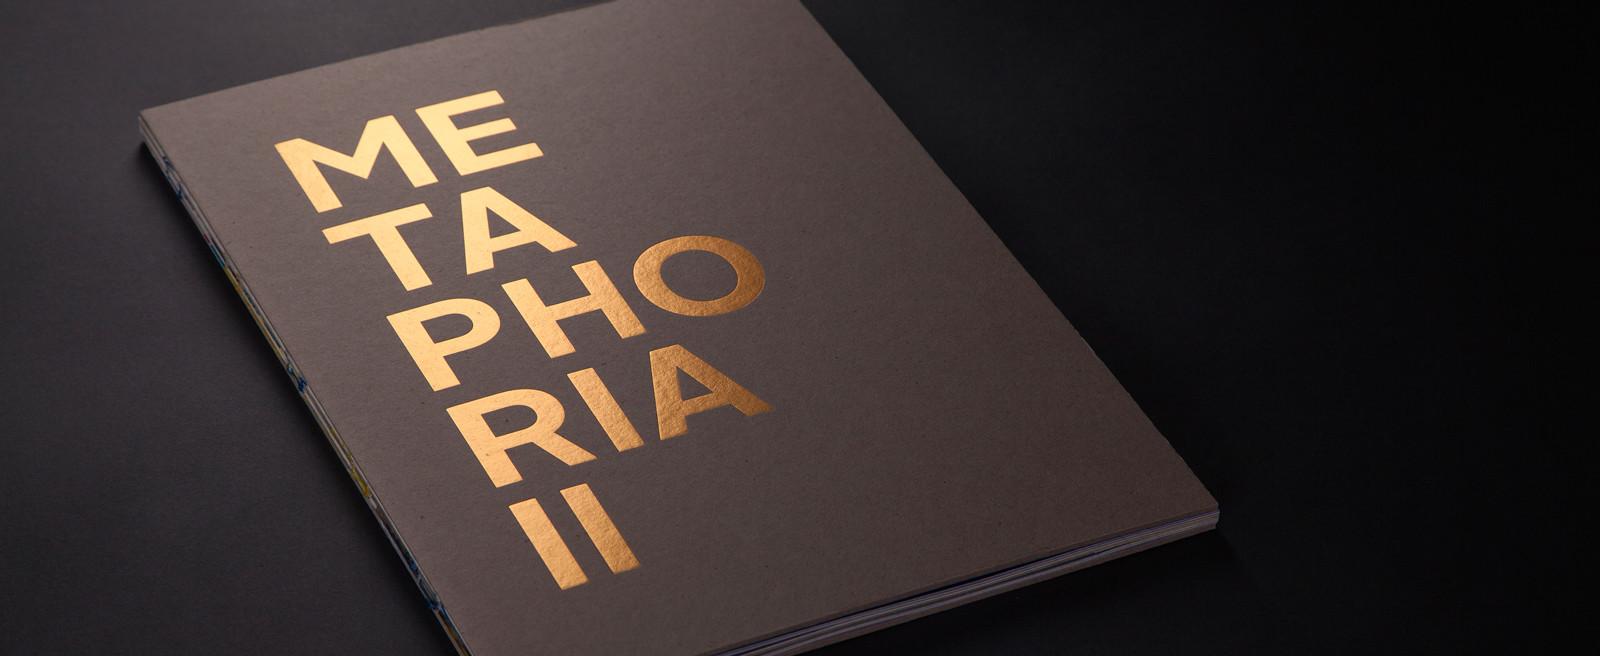 Metaphoria II, obilazak izložbe katalogom